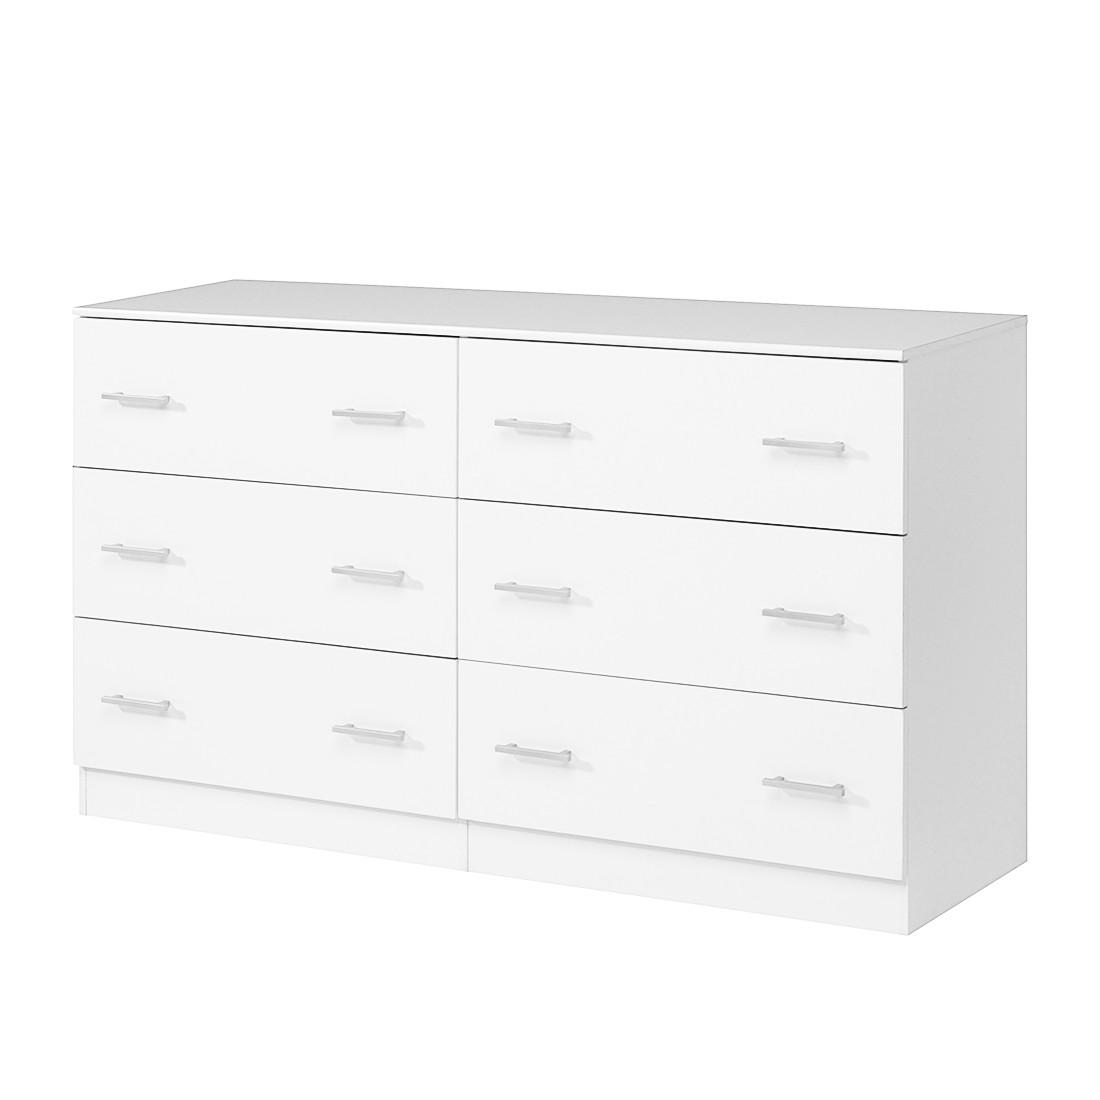 parisot 1221tiro mat commode 3 tiroirs caf comparer les prix et promo. Black Bedroom Furniture Sets. Home Design Ideas